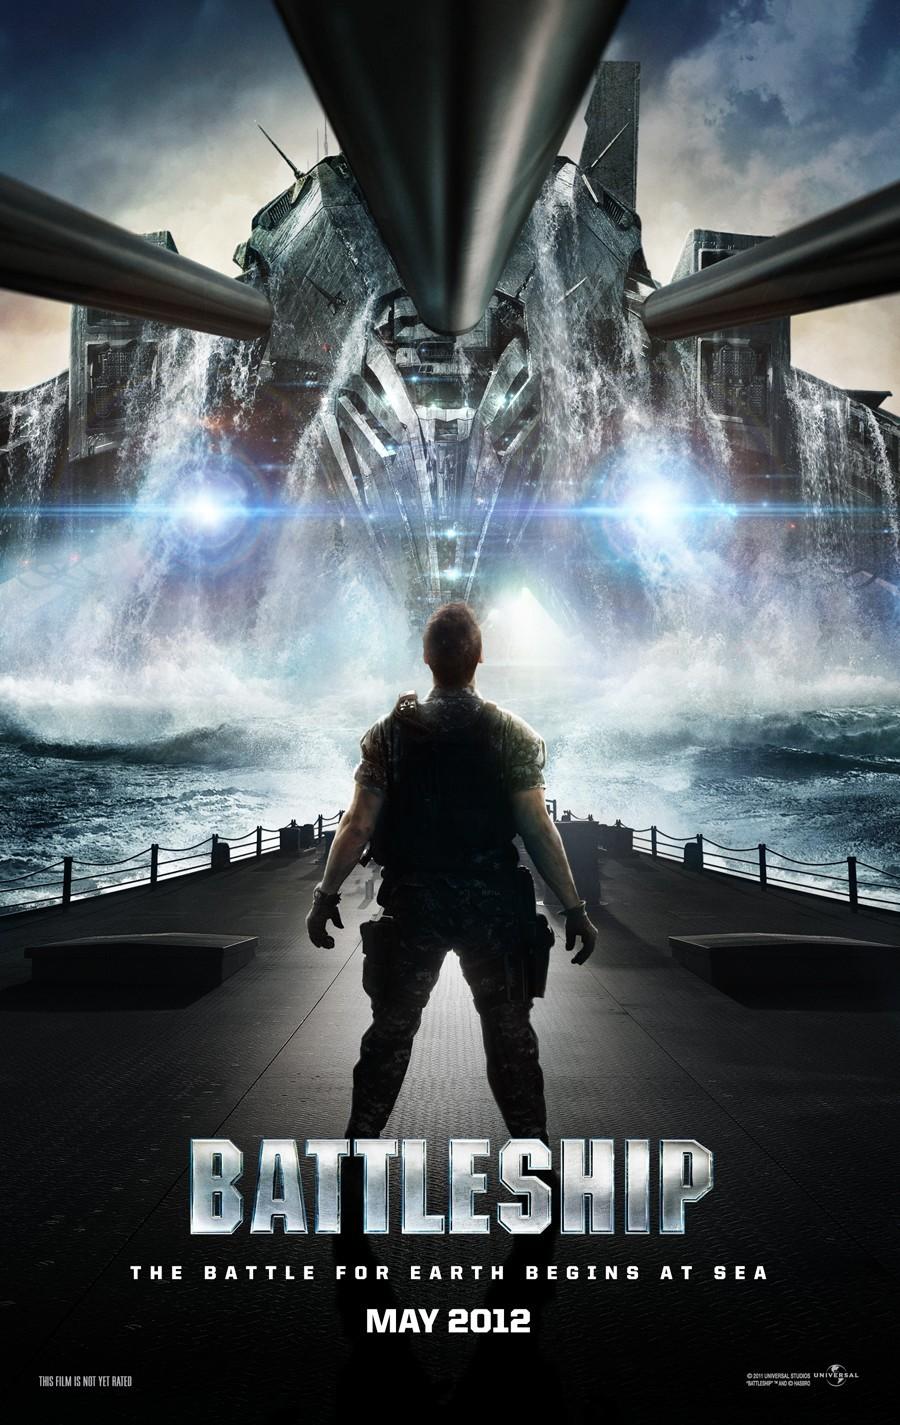 http://4.bp.blogspot.com/-NrixnqarUNM/T4osH21cObI/AAAAAAAAEzs/8dji96wpoMk/s1600/Battleship%2B2012%2B360s.vn.jpg